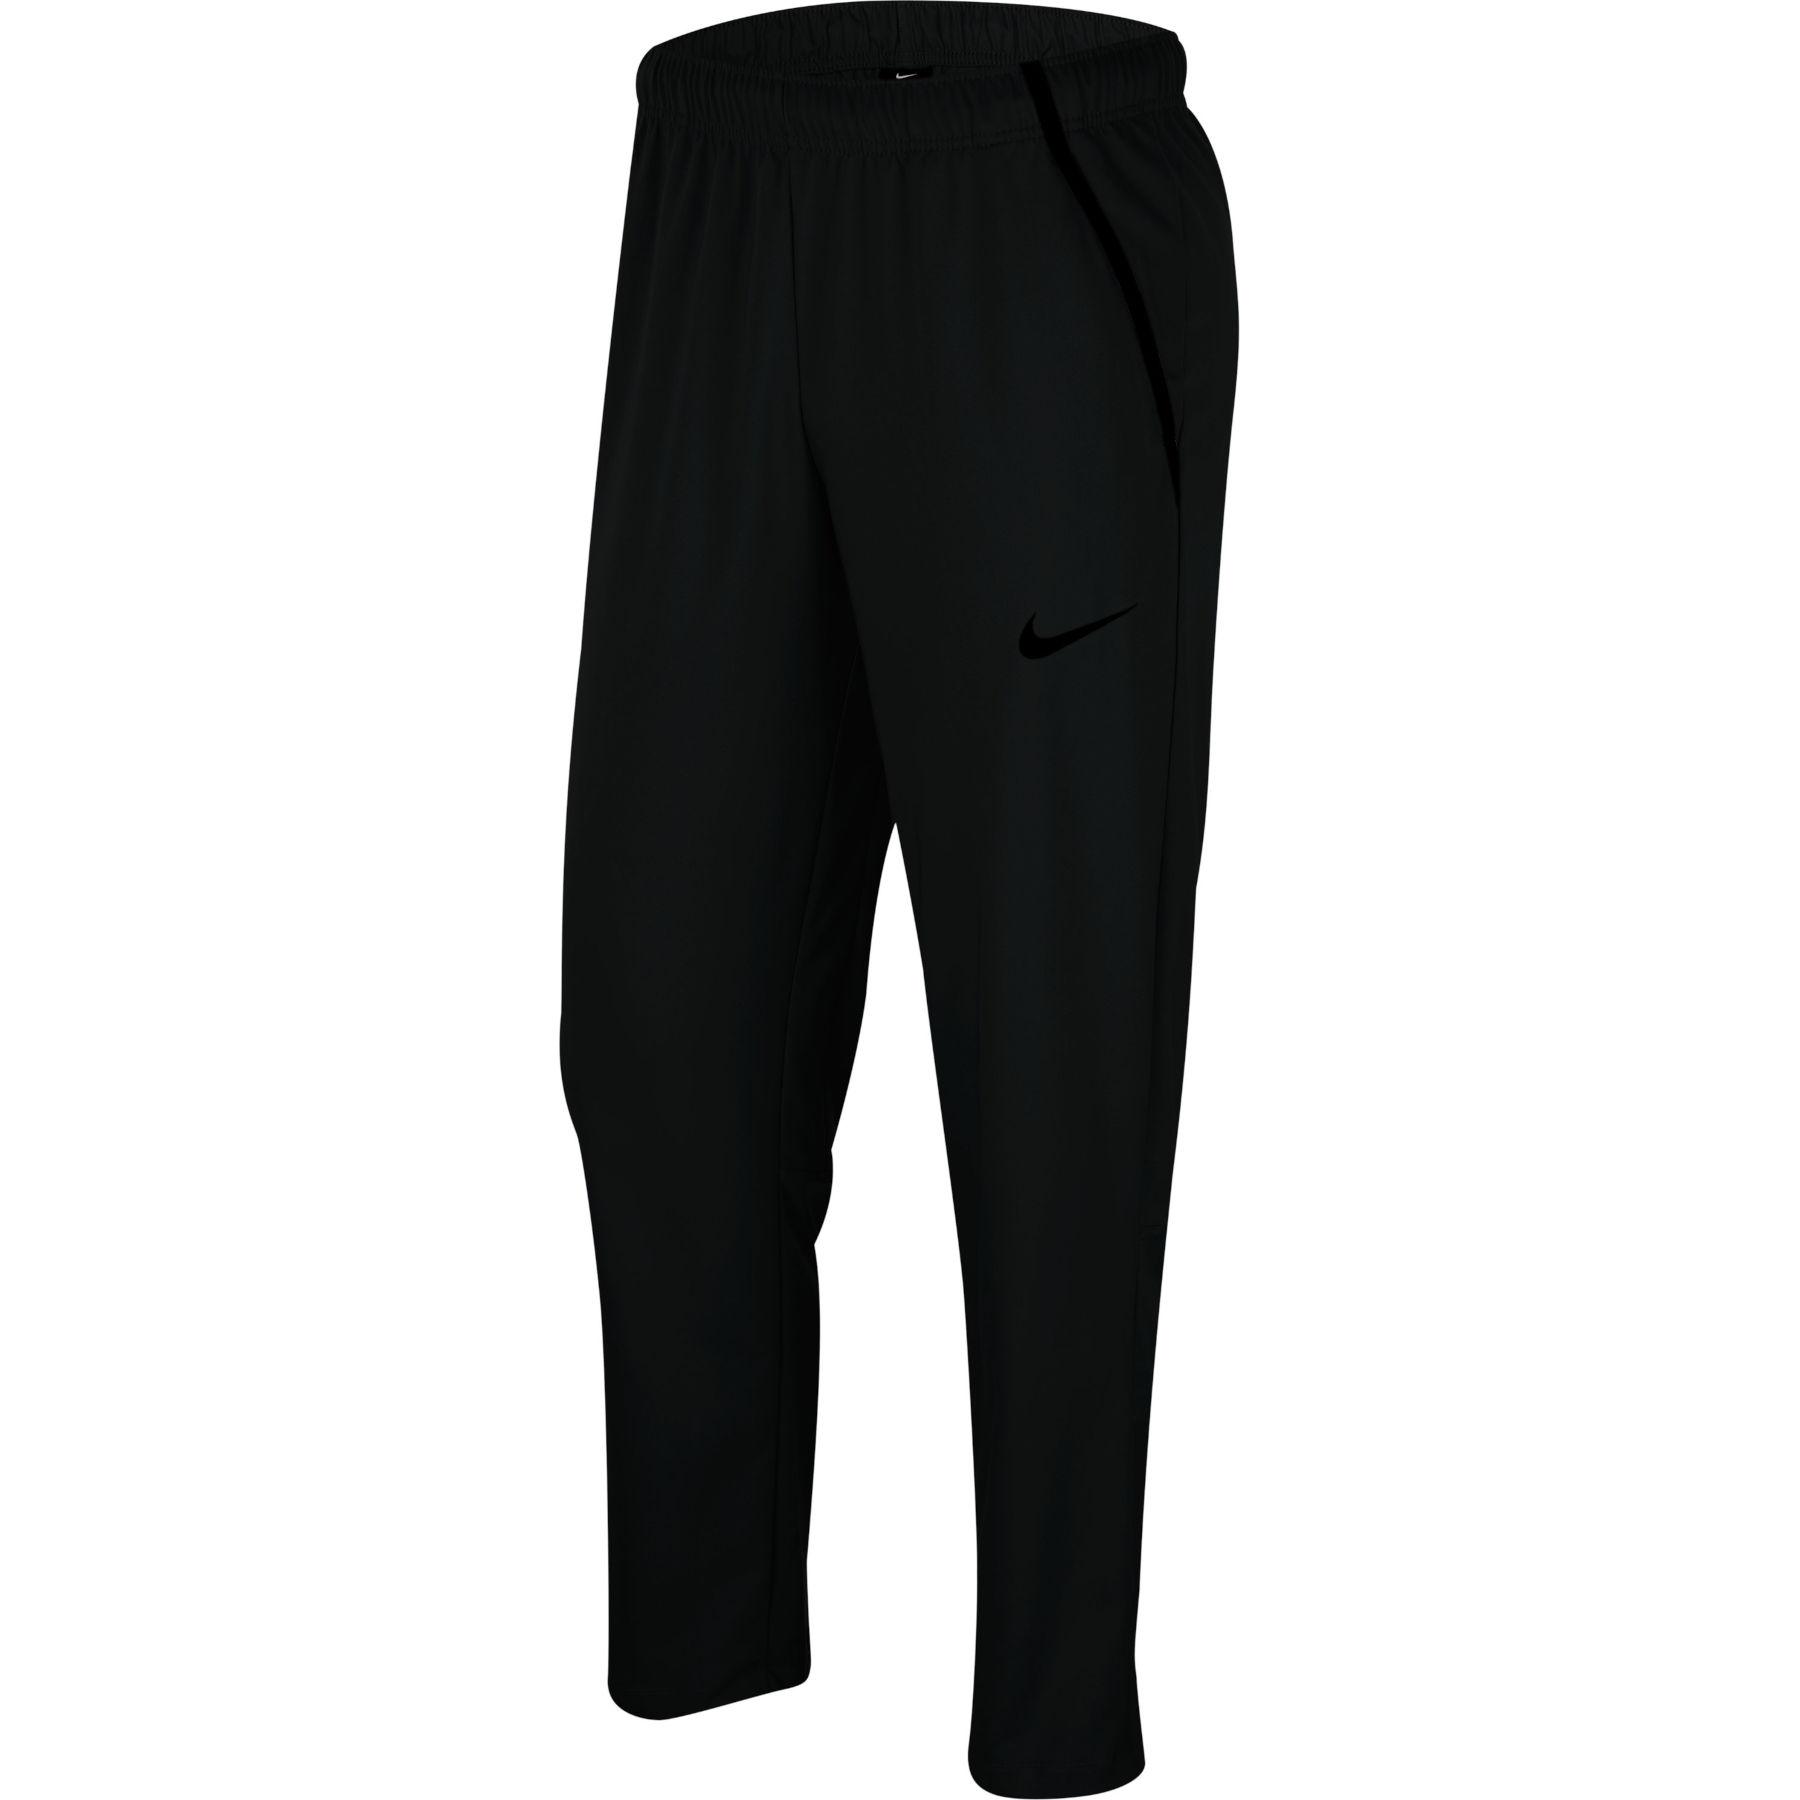 Foto de Nike Dry Team Woven Pantalones de chándal para hombre - black/black CU4957-010